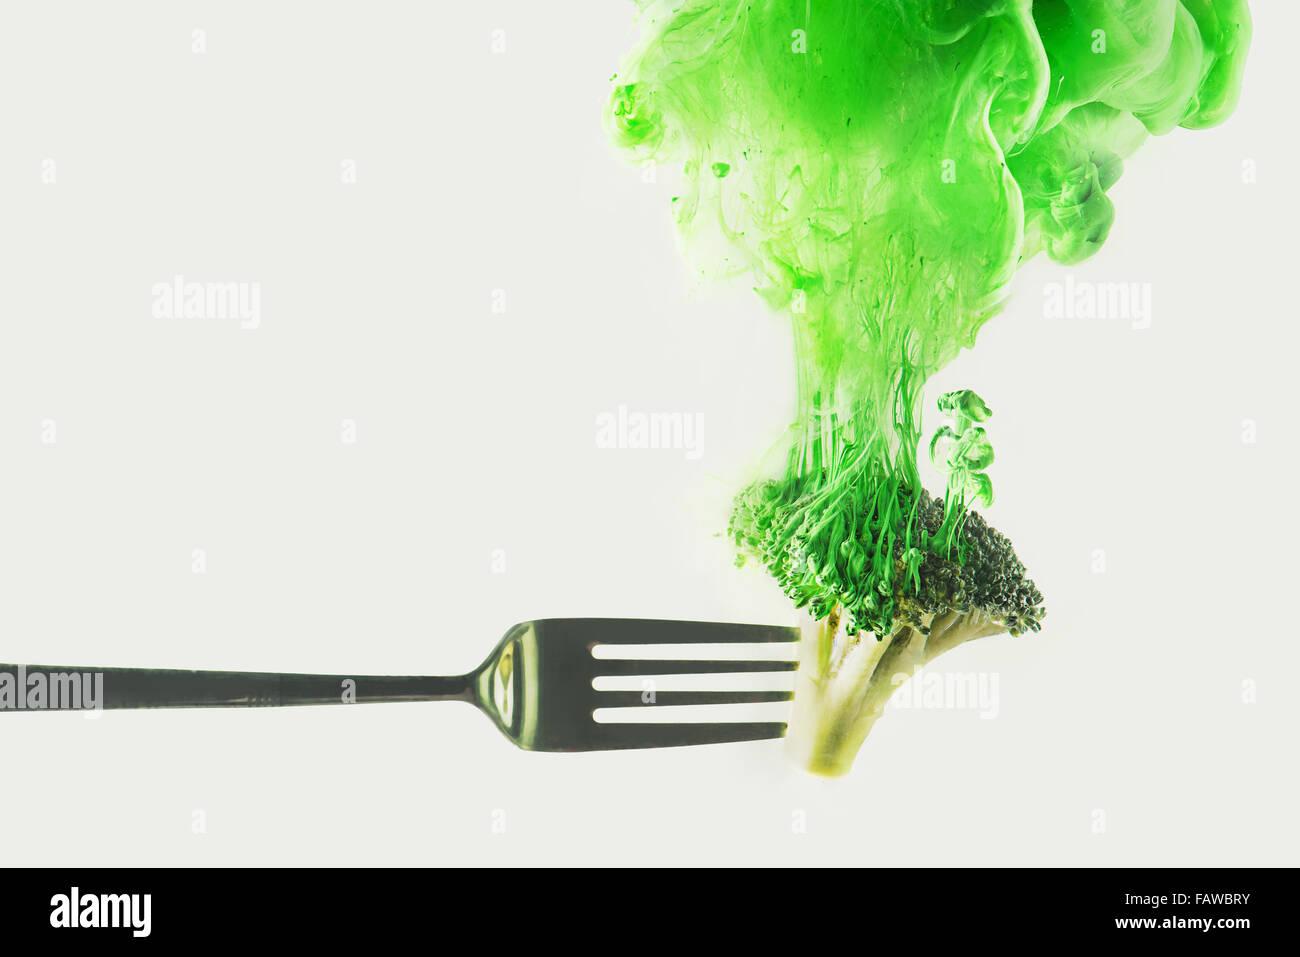 Disintegrated broccoli - Stock Image